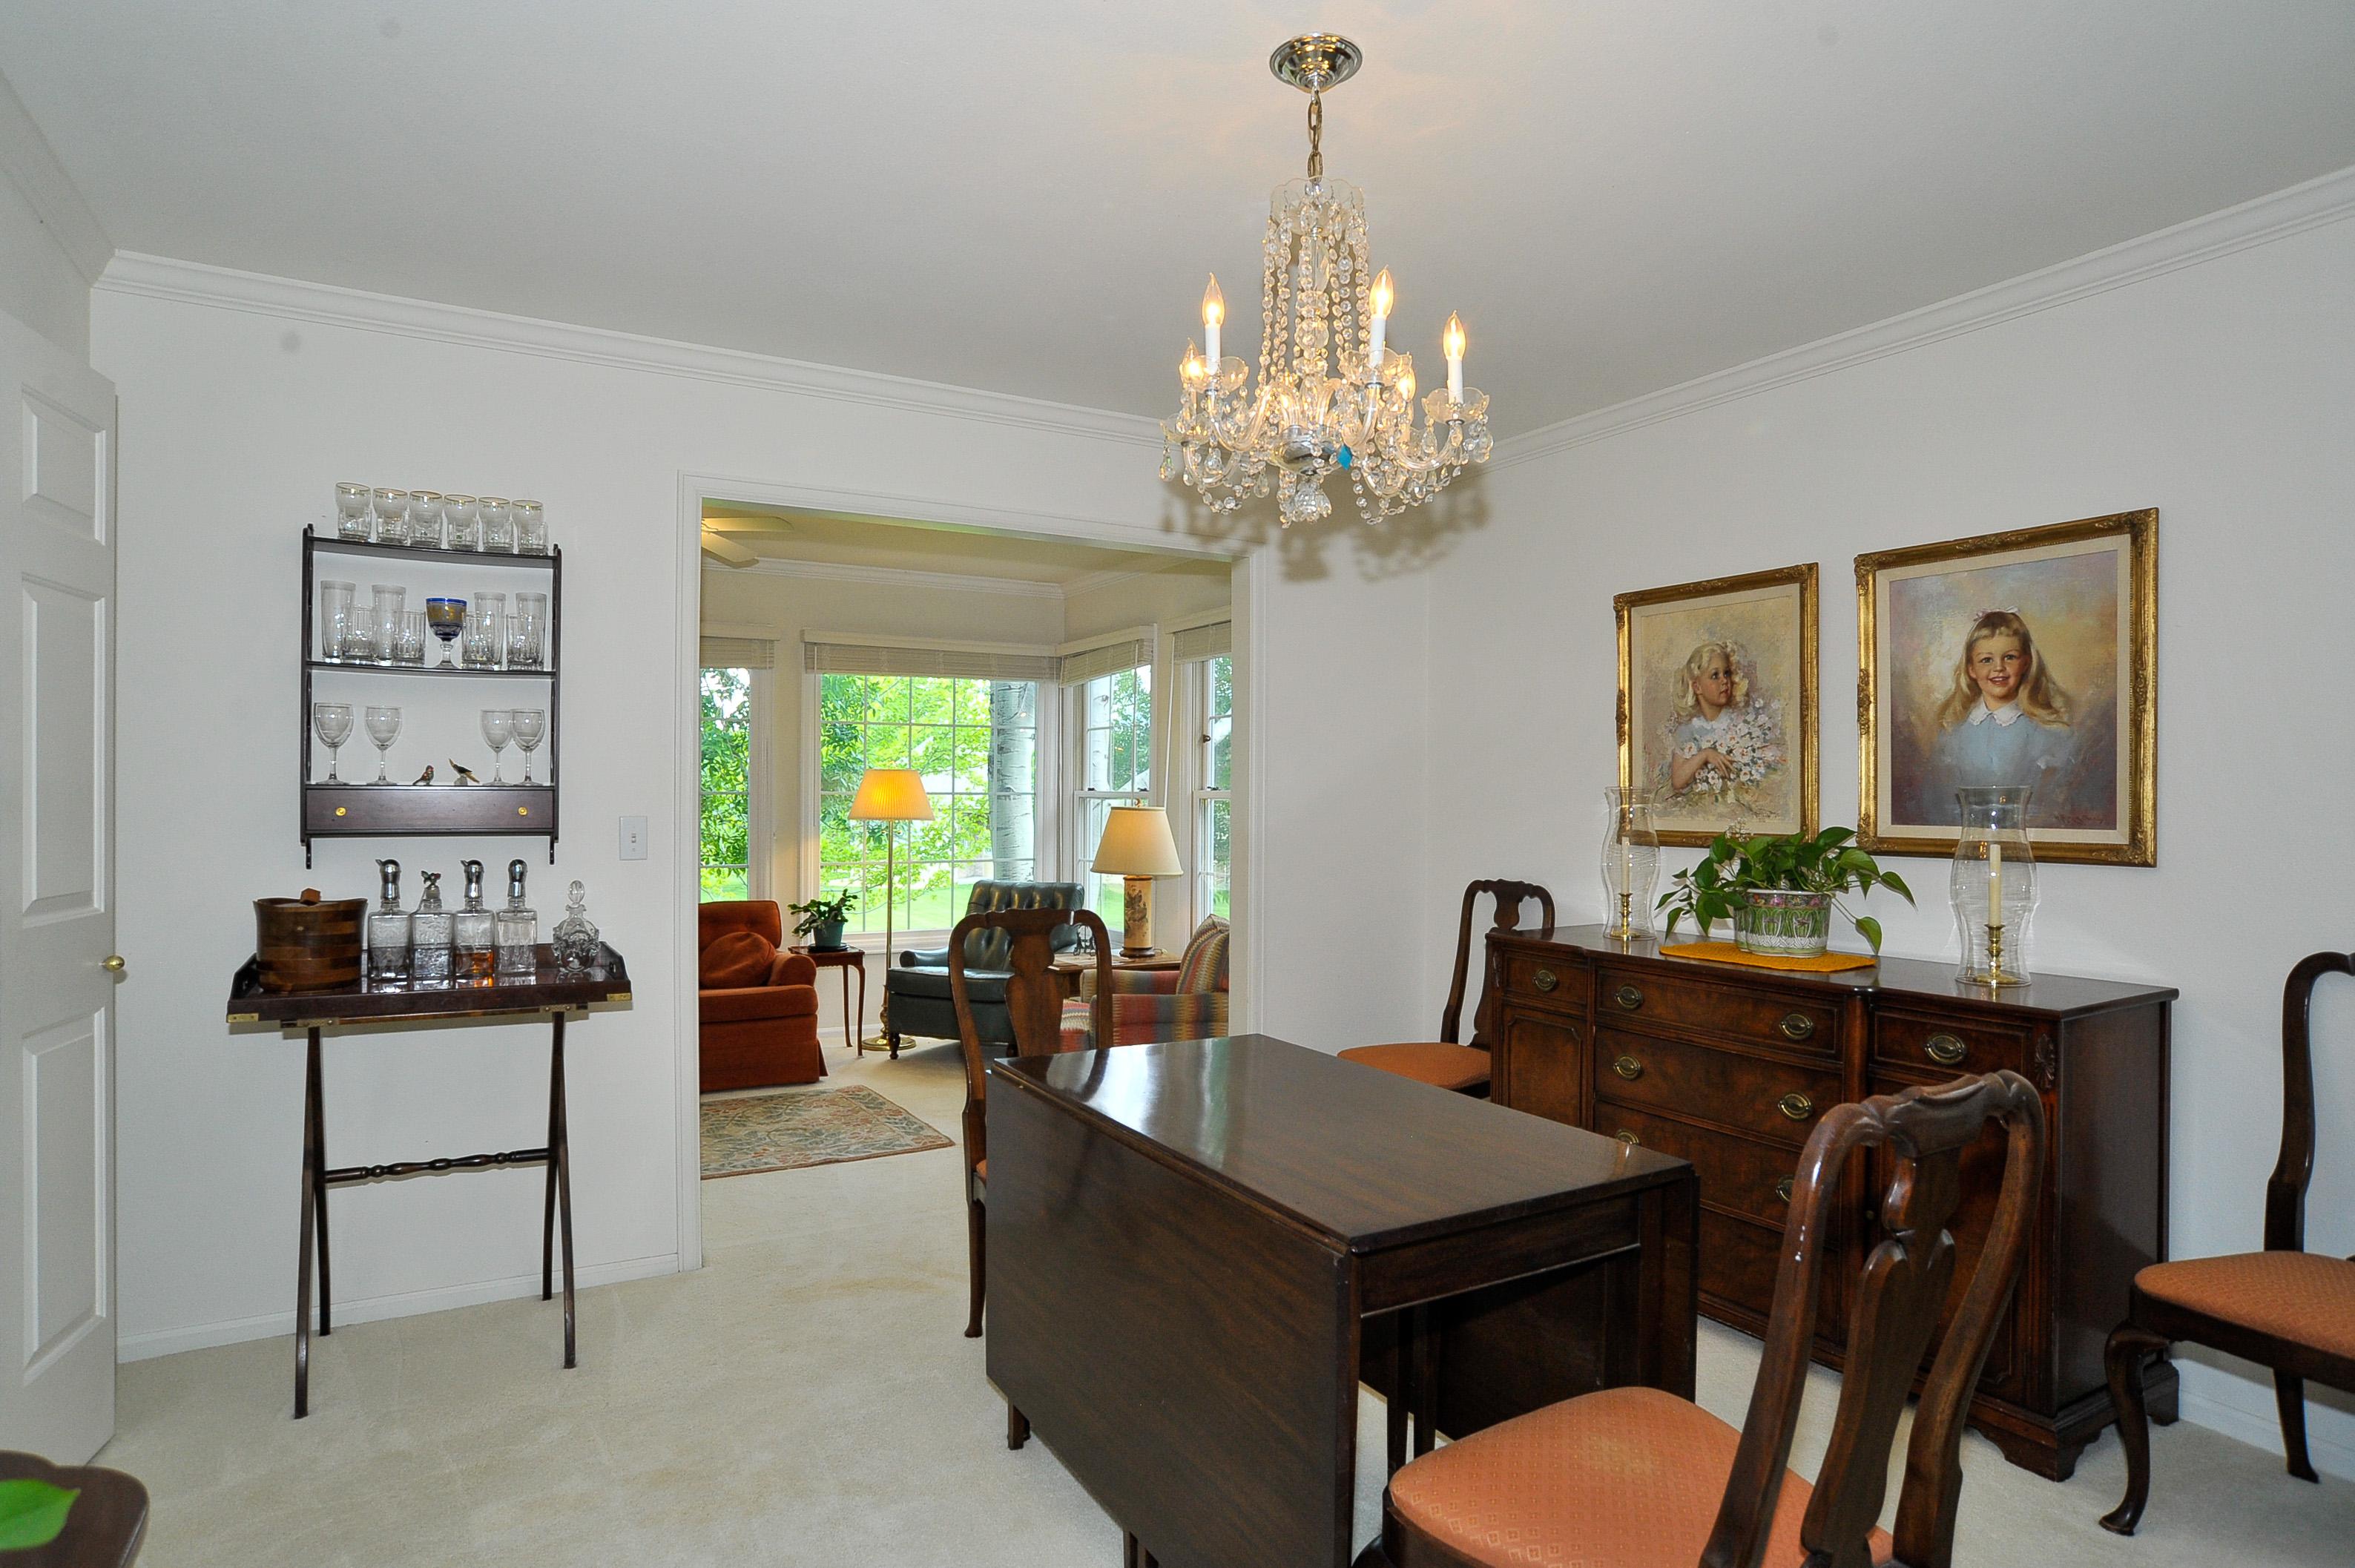 Room for for Formal Dining Room Furniture